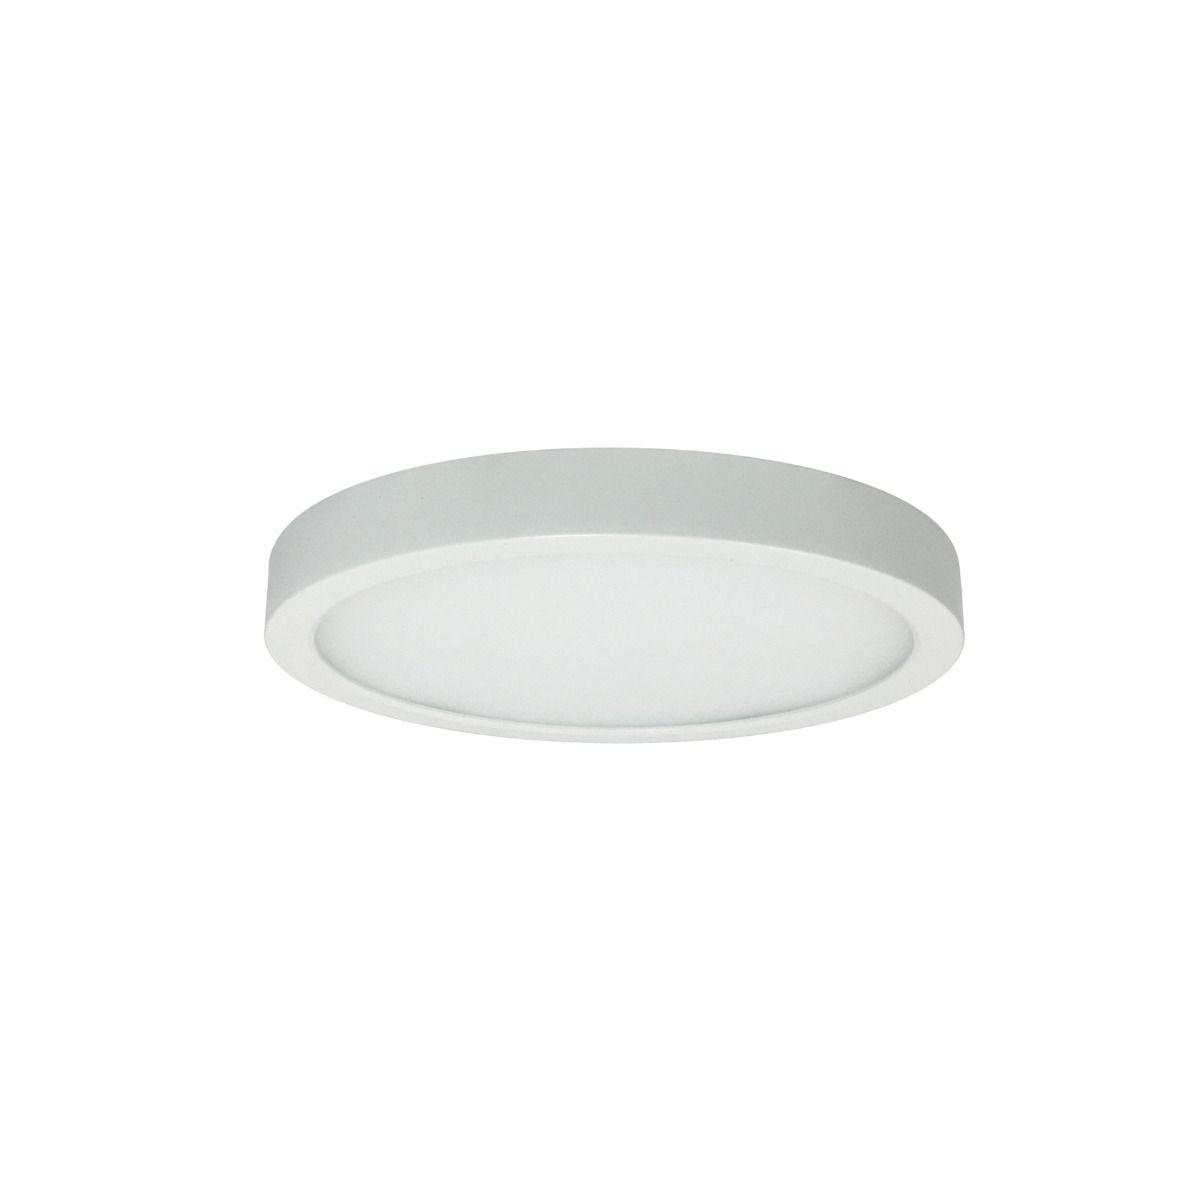 Alcon Lighting 11170 5 Disk